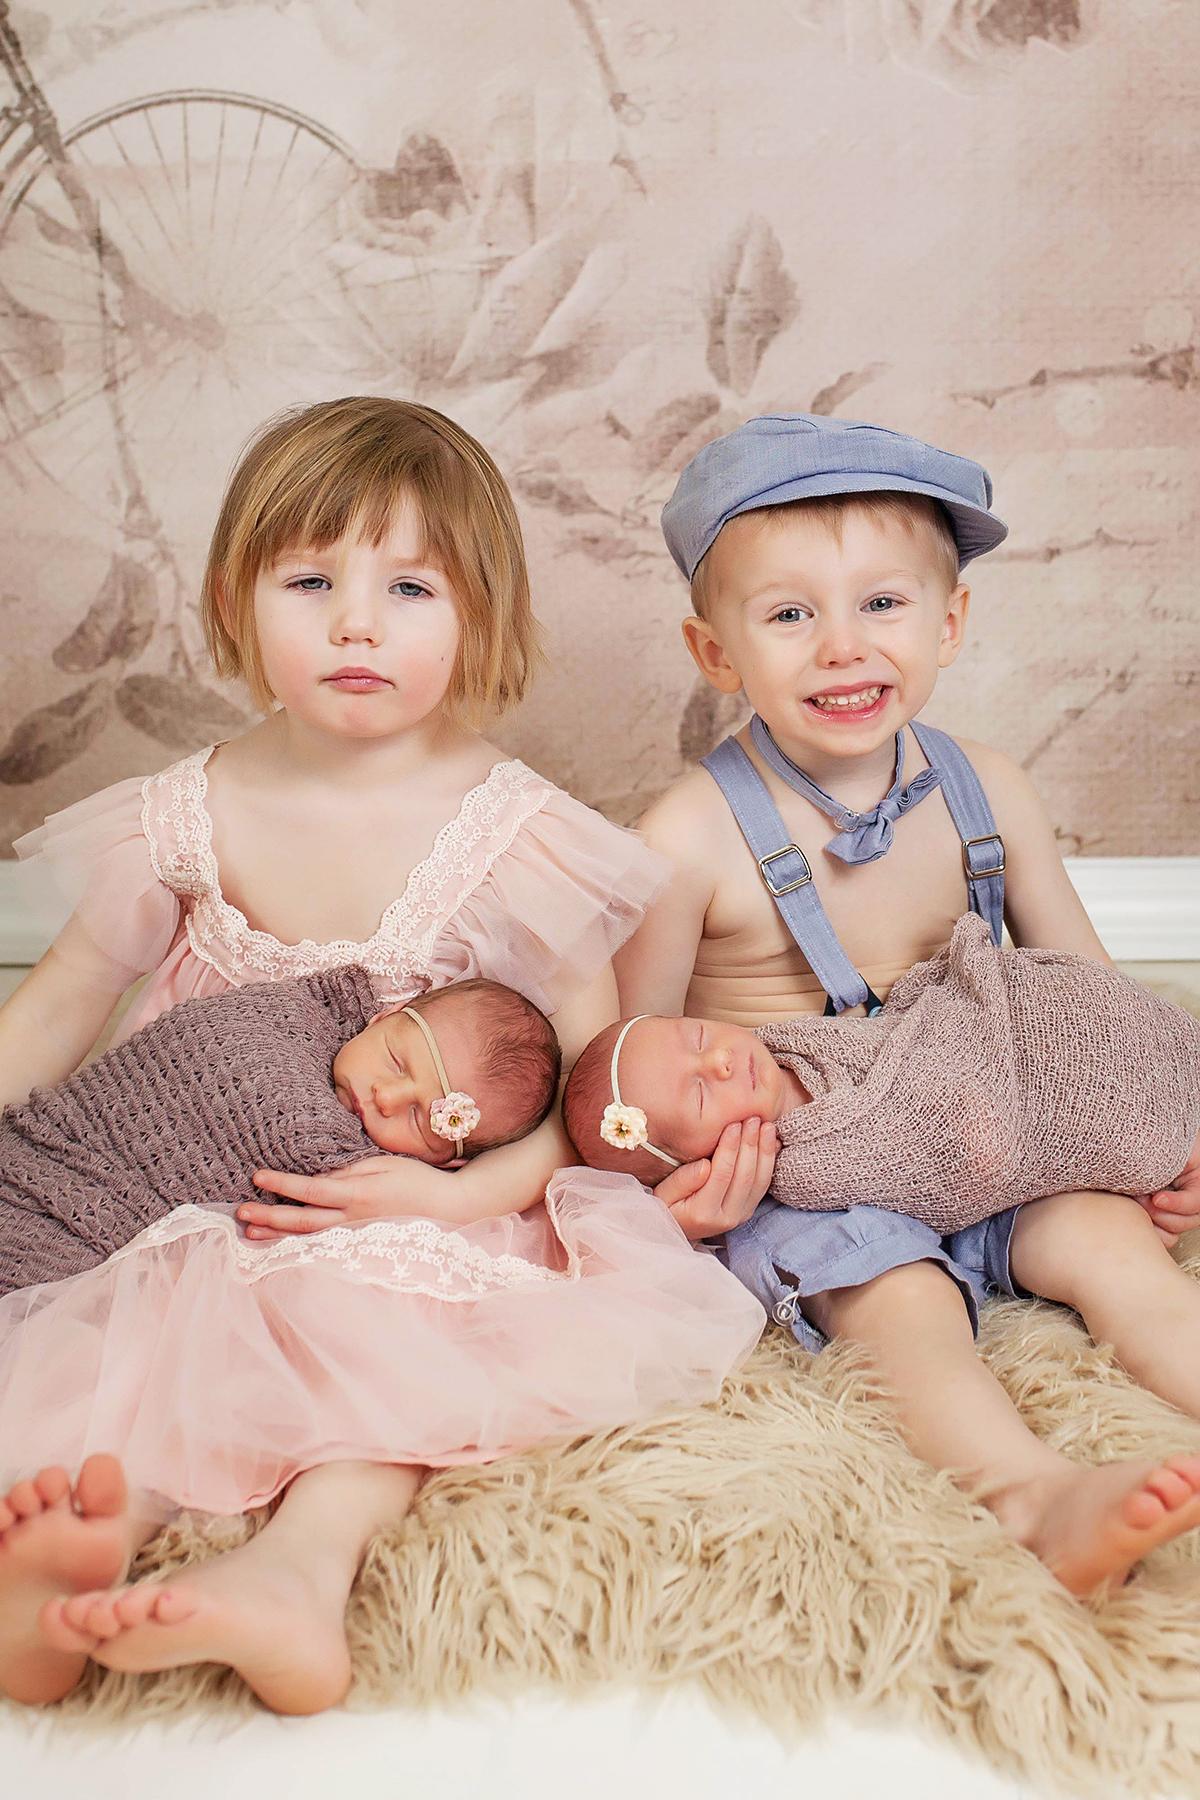 Toddler Twins Cuddling Their Newborn Twin Siblings bored